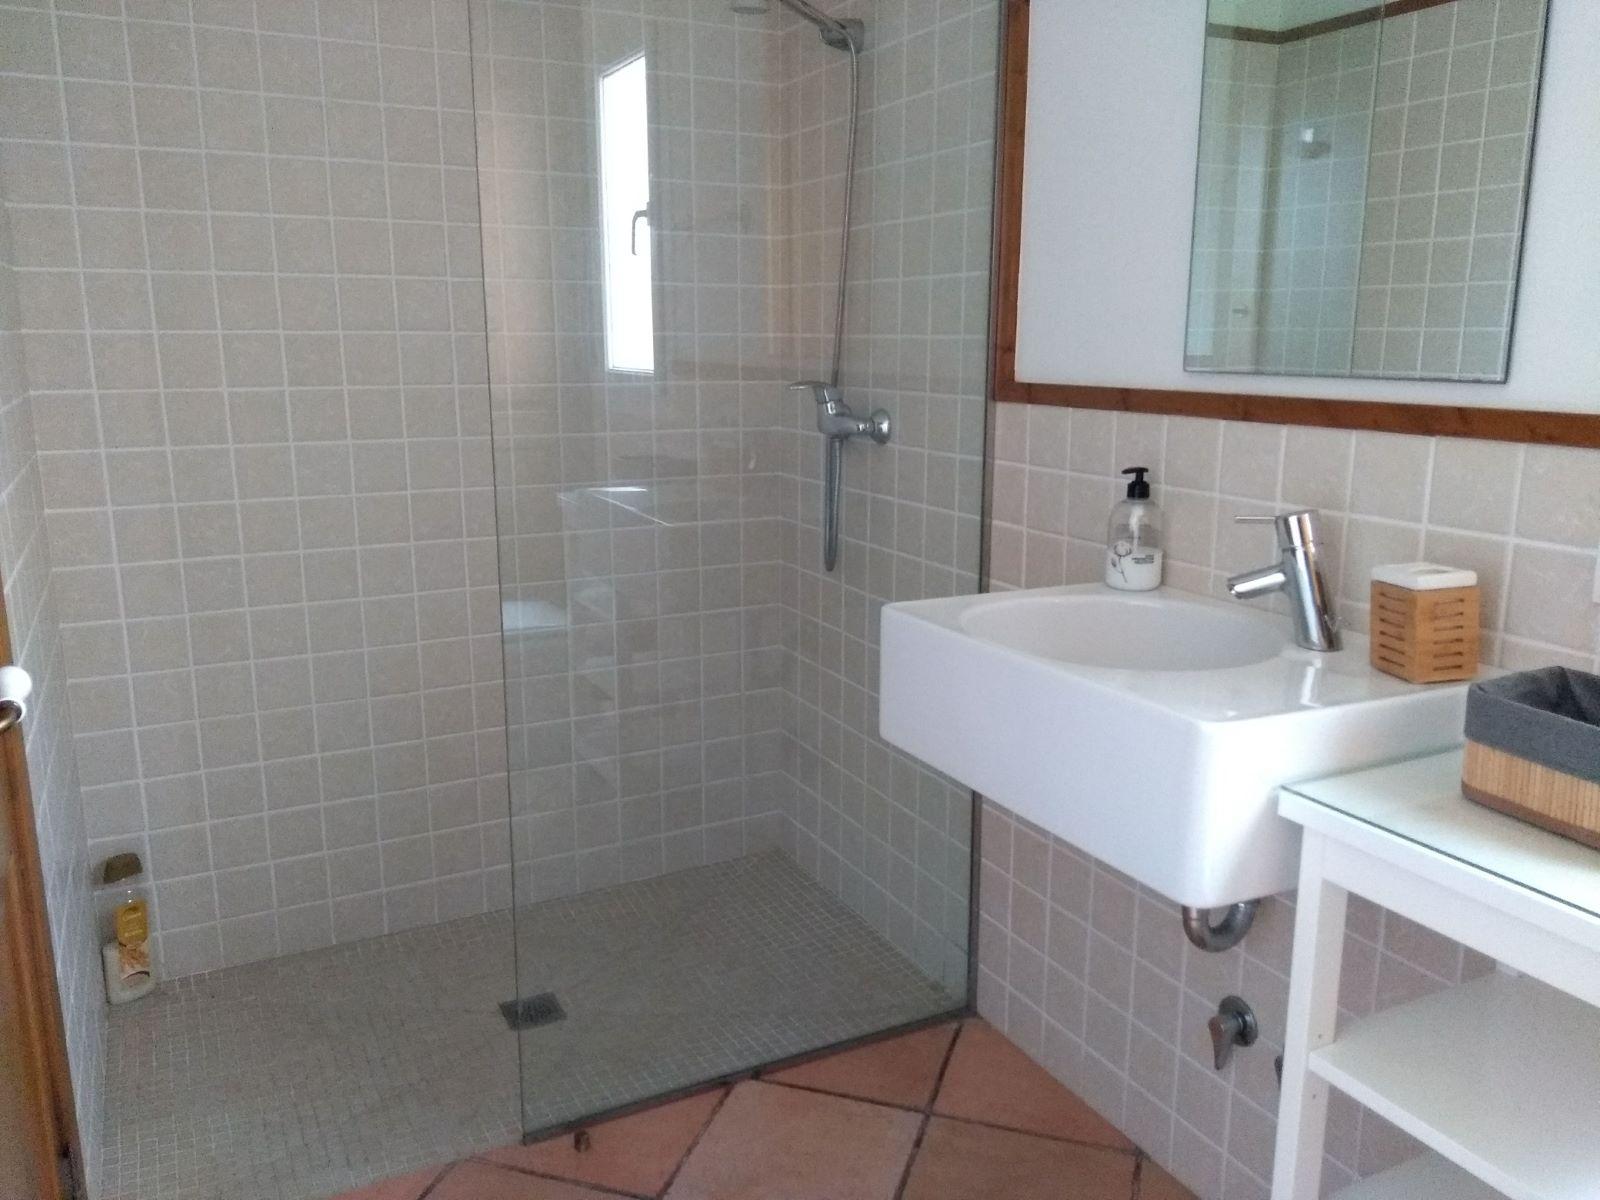 Chalet for sale in Son Blanc Ciutadella - annex bathroom